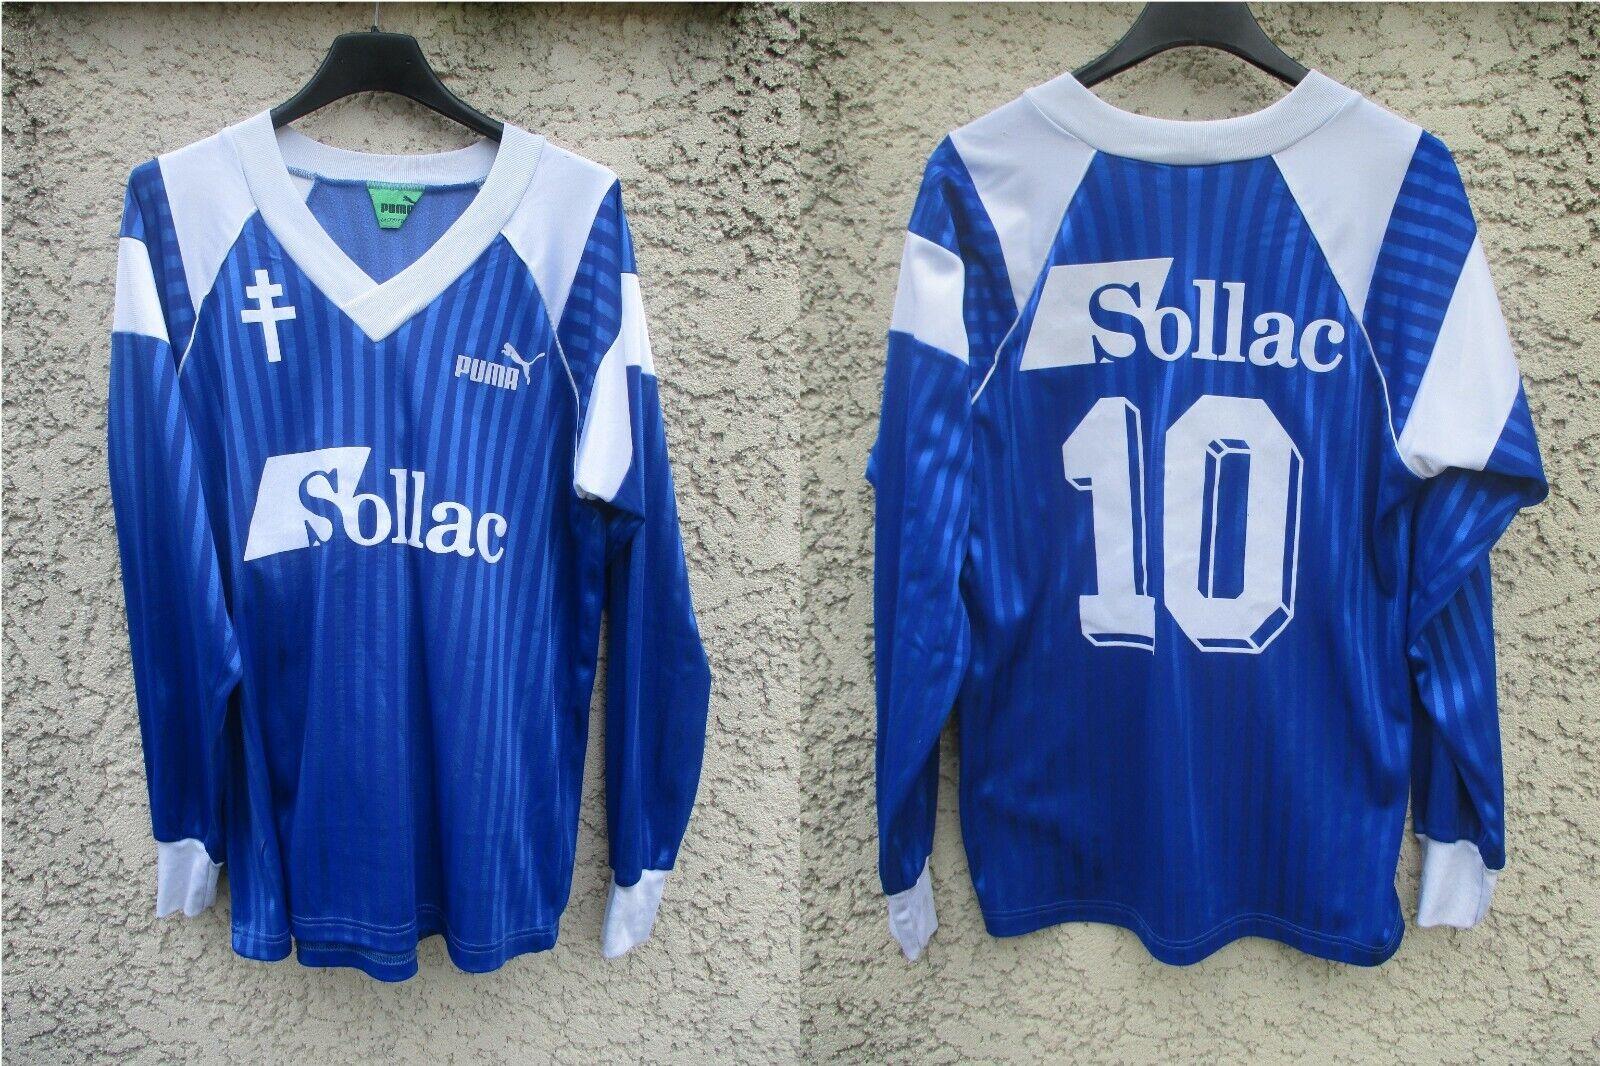 Maillot F.C METZ n°10 1992 PUMA vintage away shirt trikot manches longues L S S